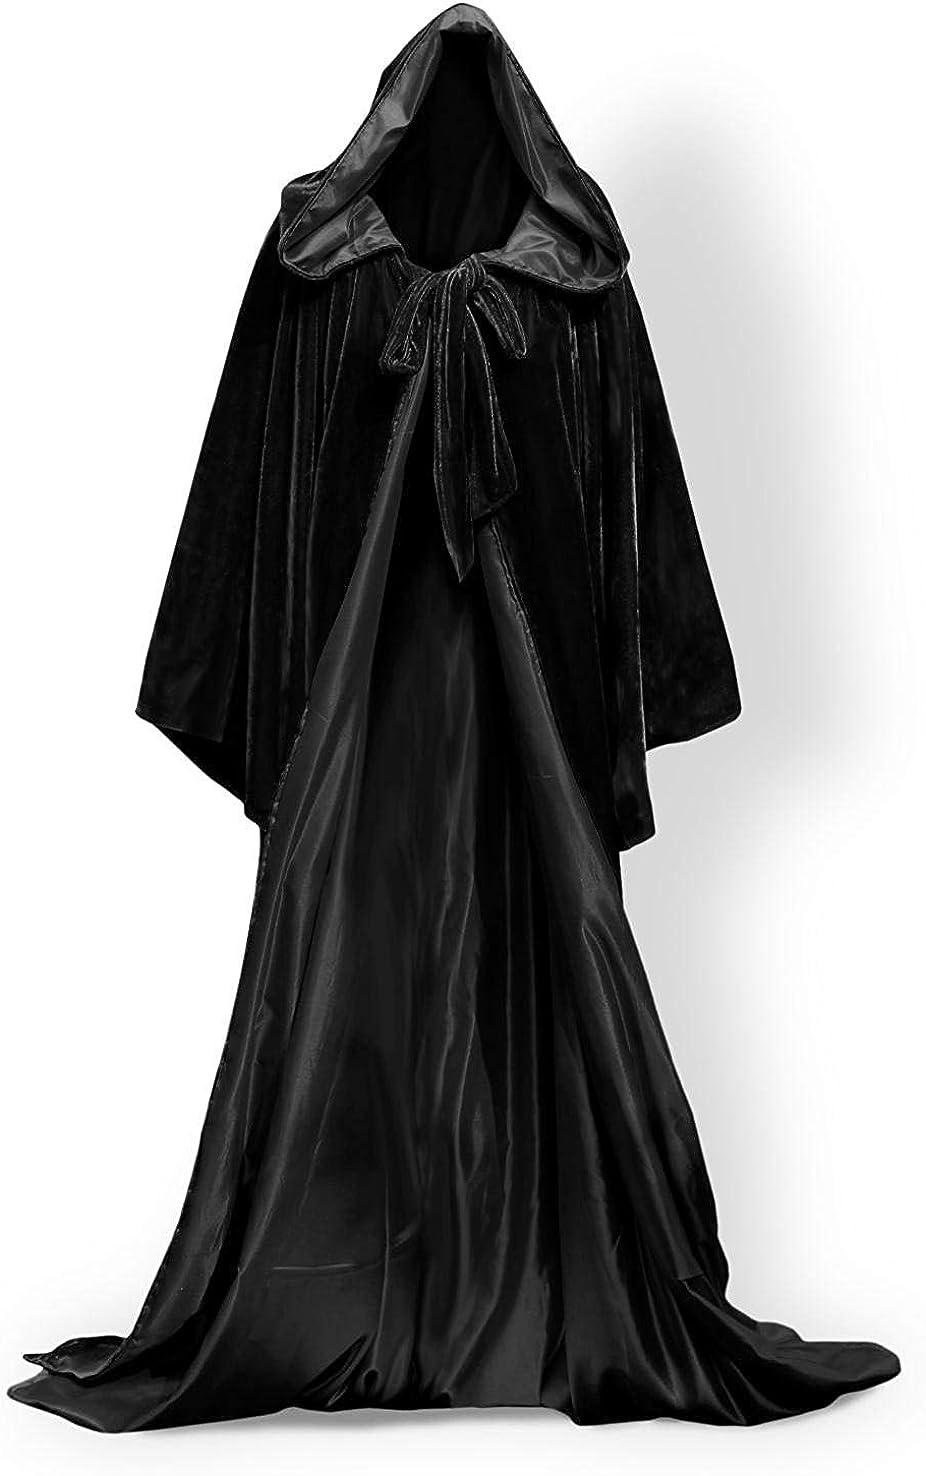 homebed Hooded Cloak Black Halloween Wizard Robe Long Sleeve for Christmas Fancy Coat